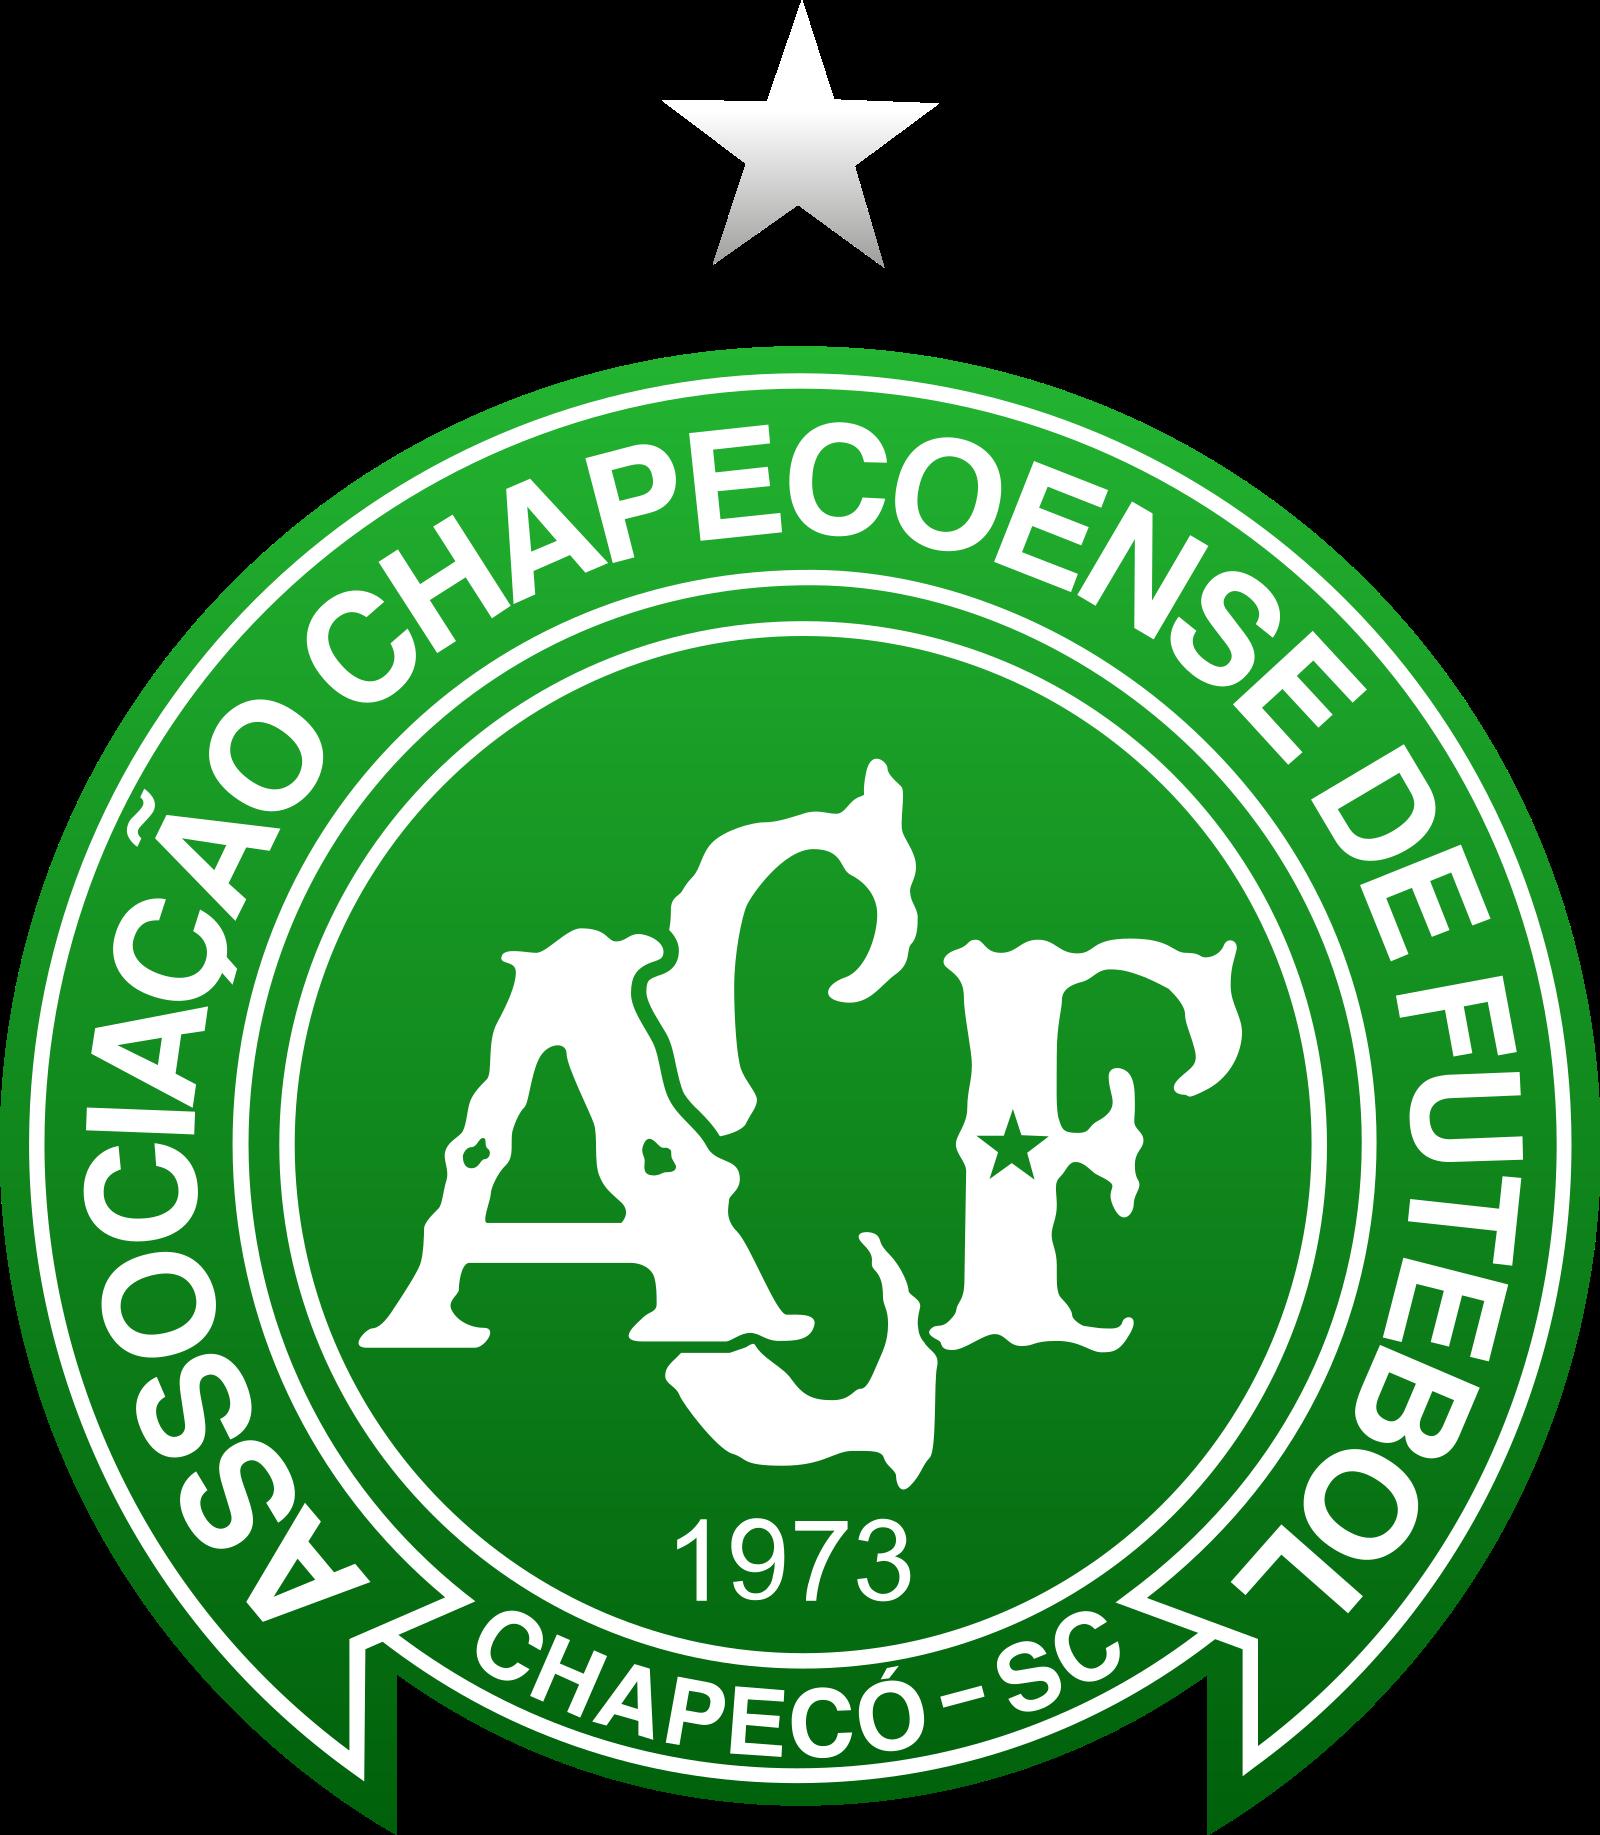 chapecoense-logo-escudo-shield-4